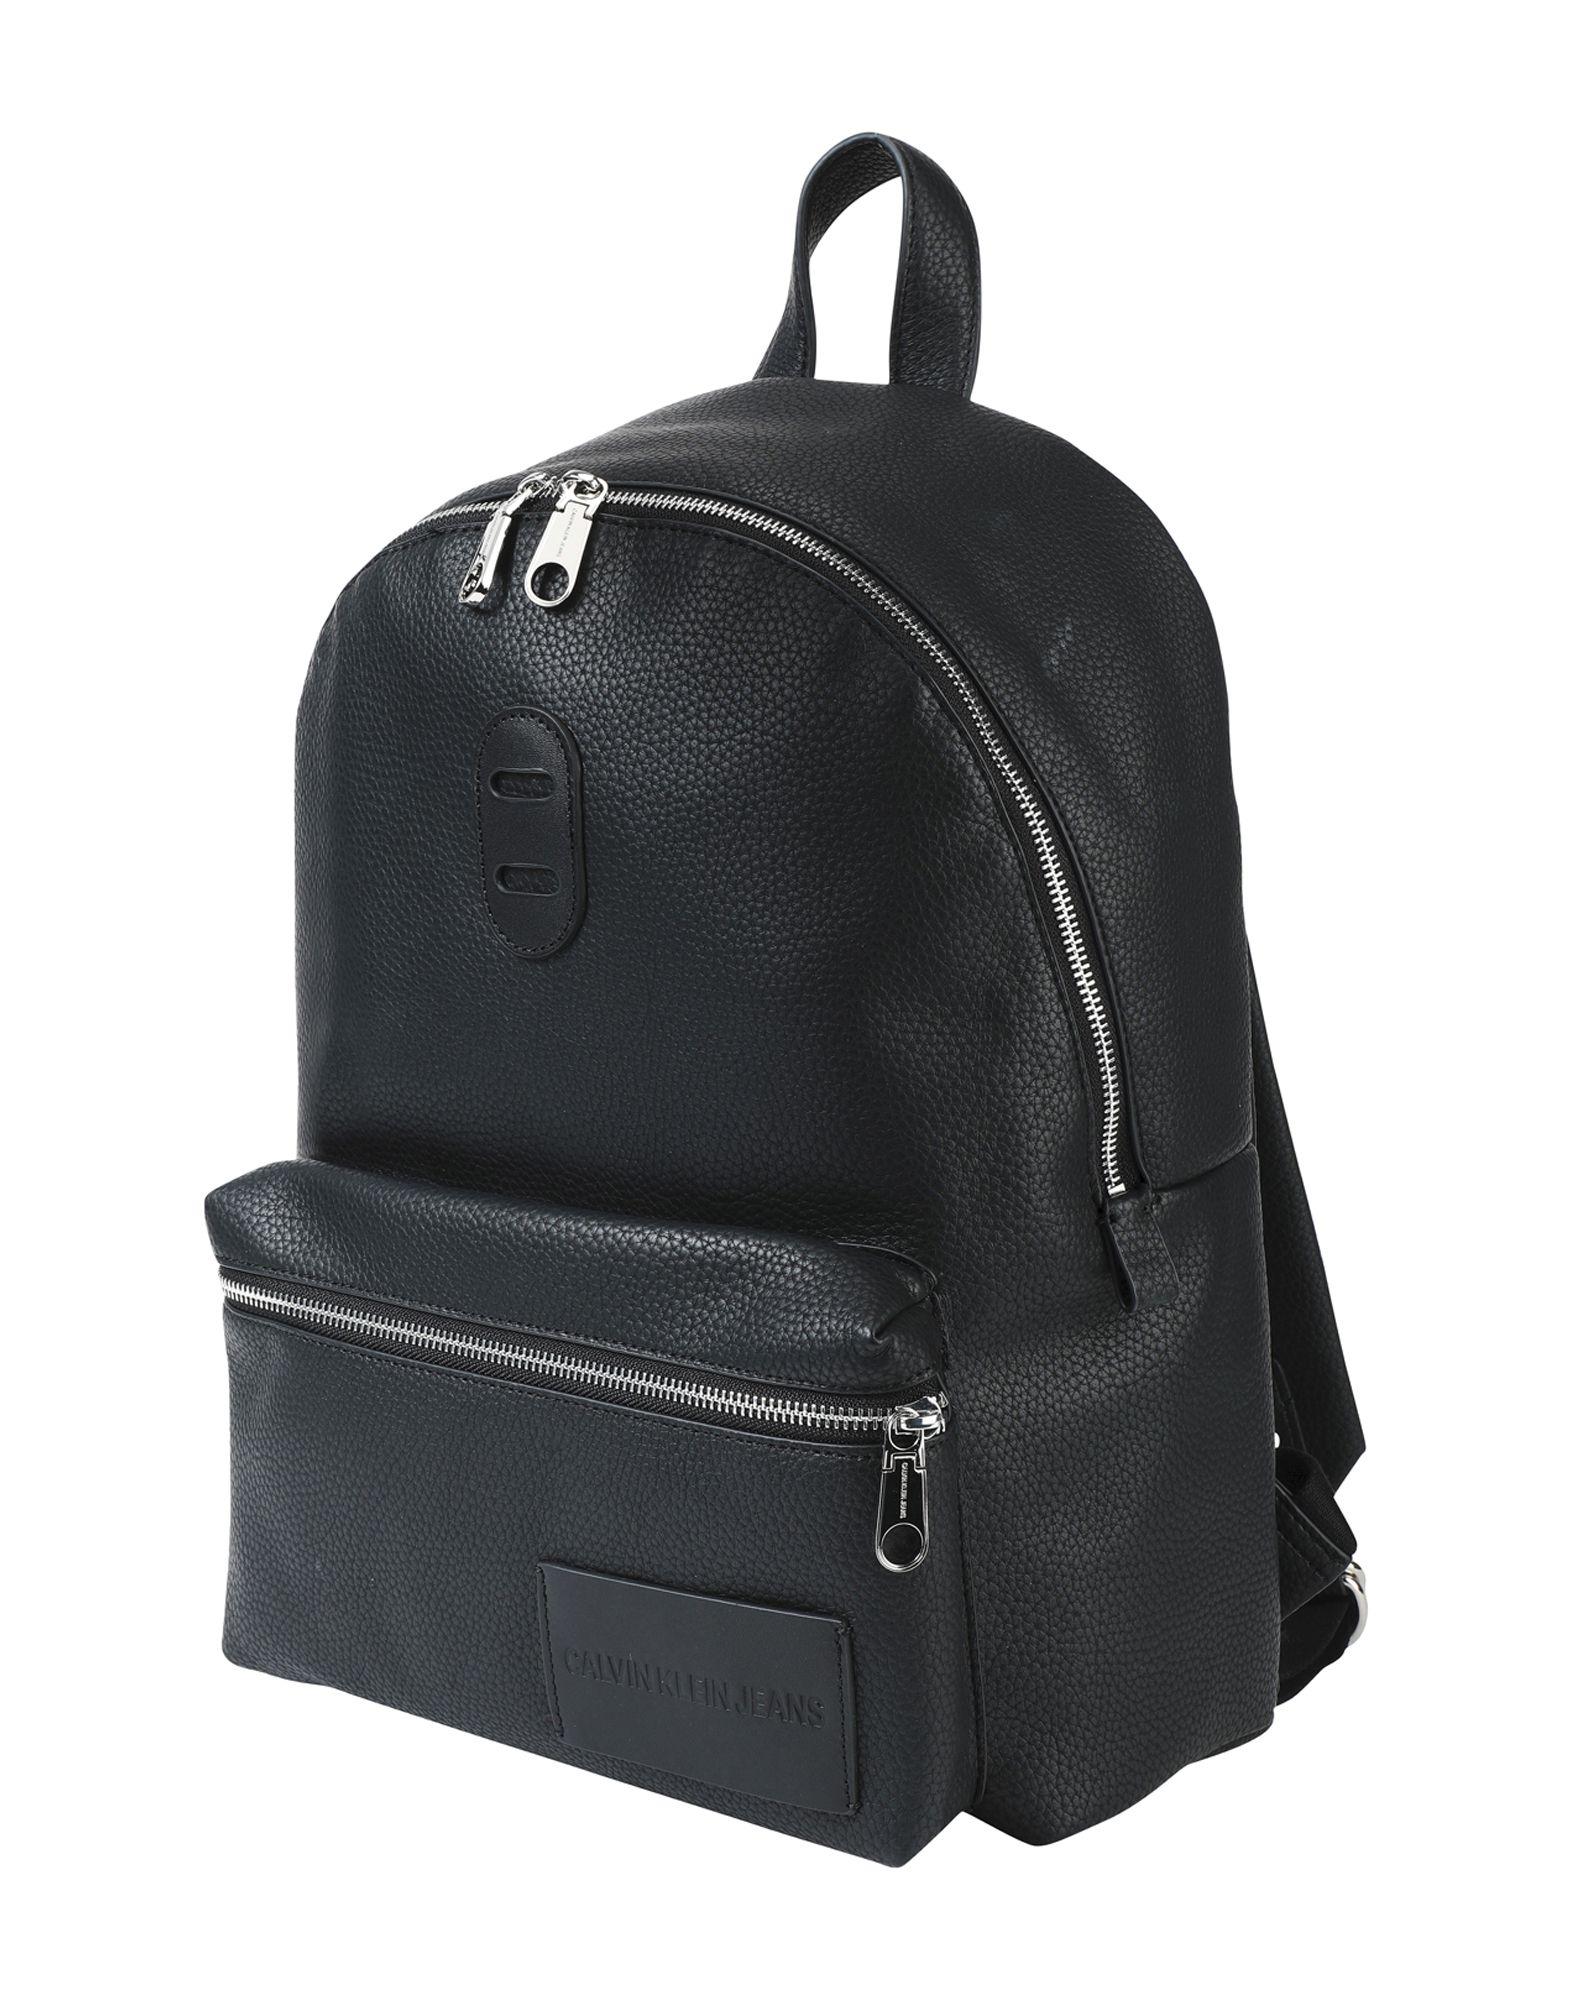 купить CALVIN KLEIN JEANS Рюкзаки и сумки на пояс по цене 11690 рублей